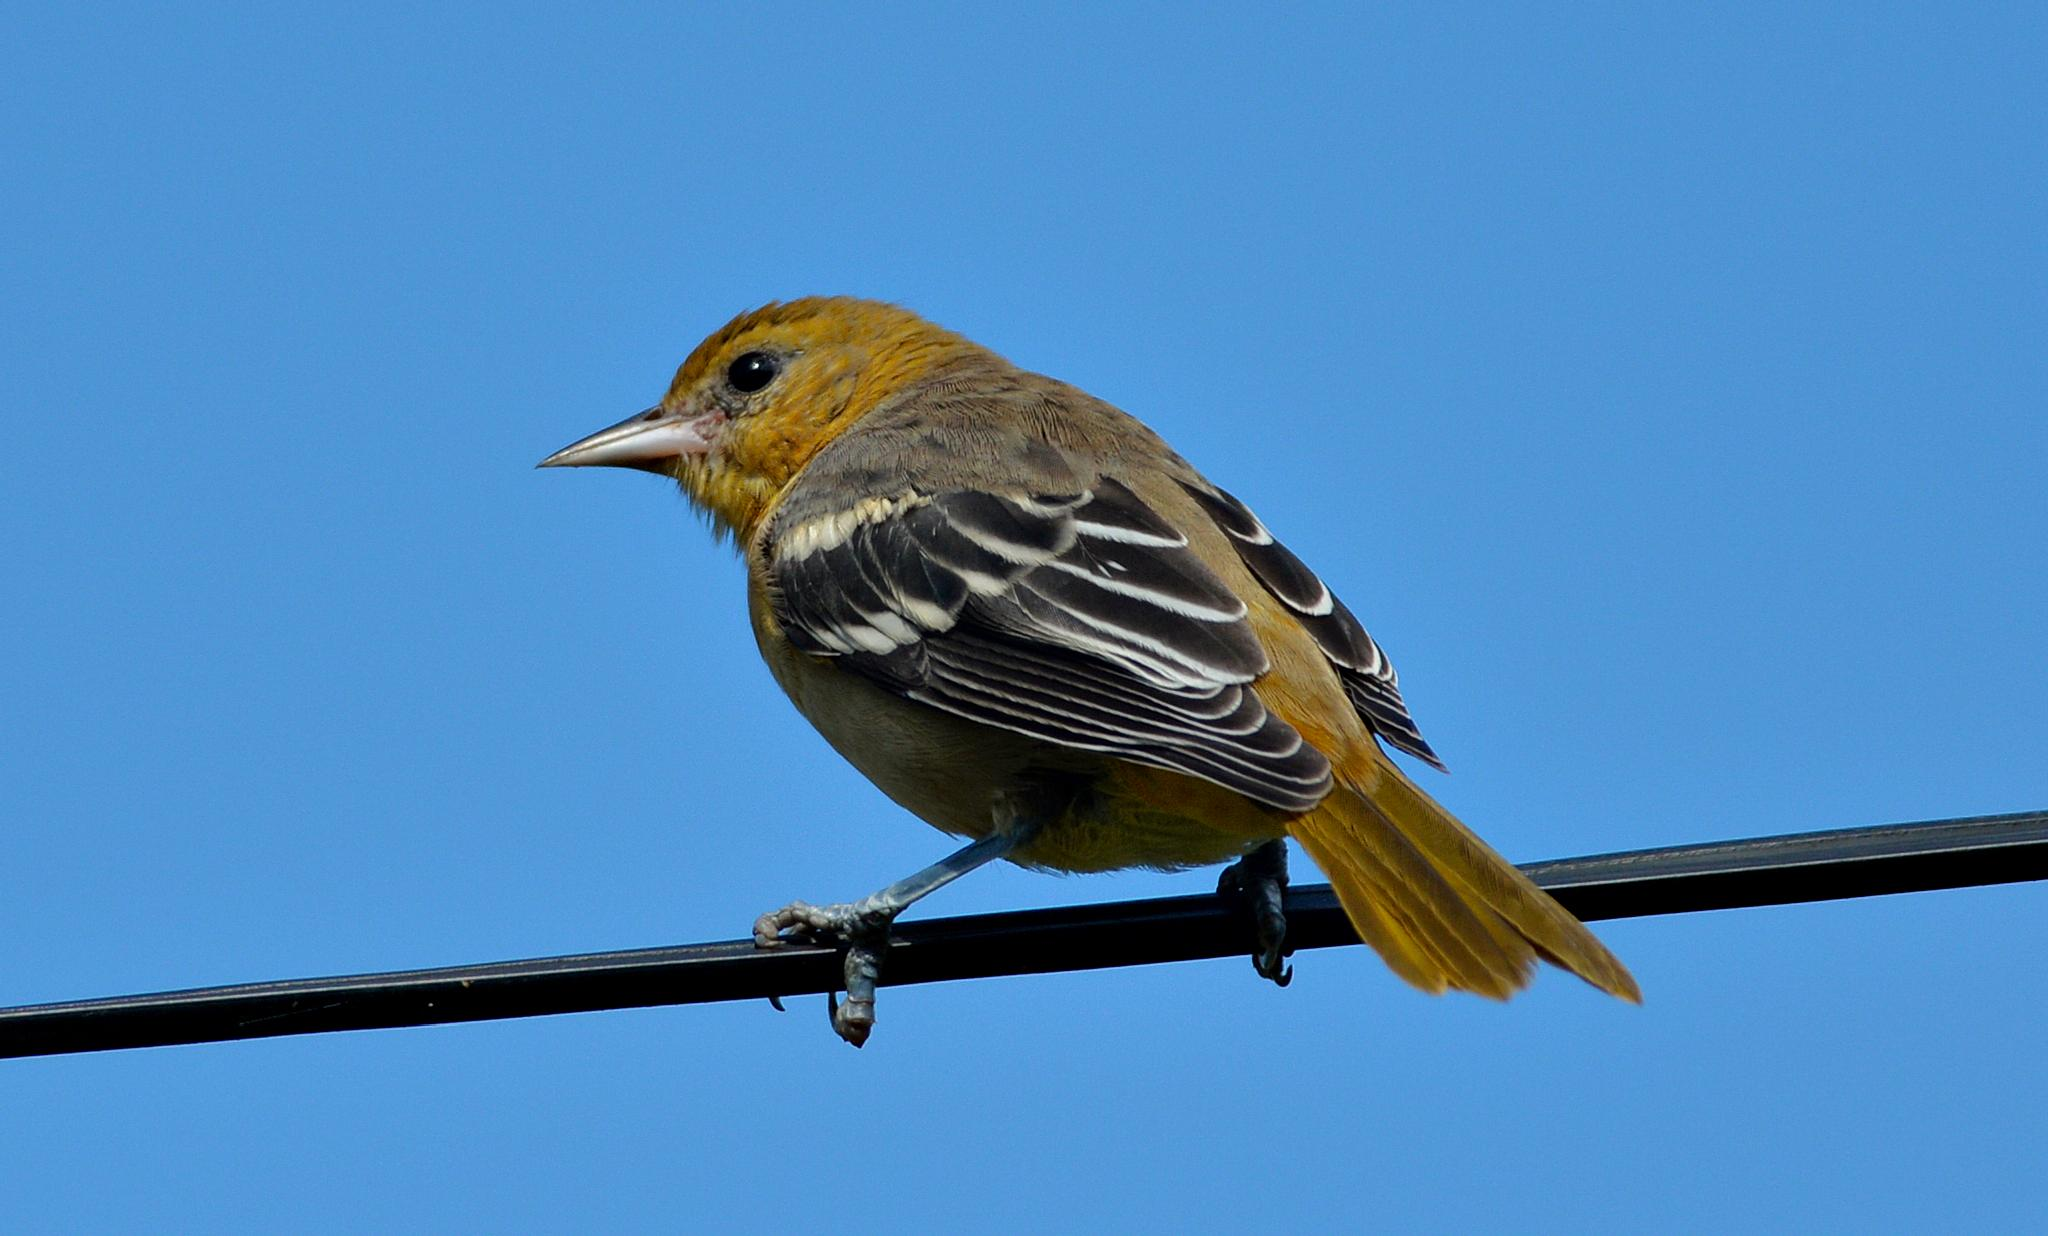 Bird by David Lam